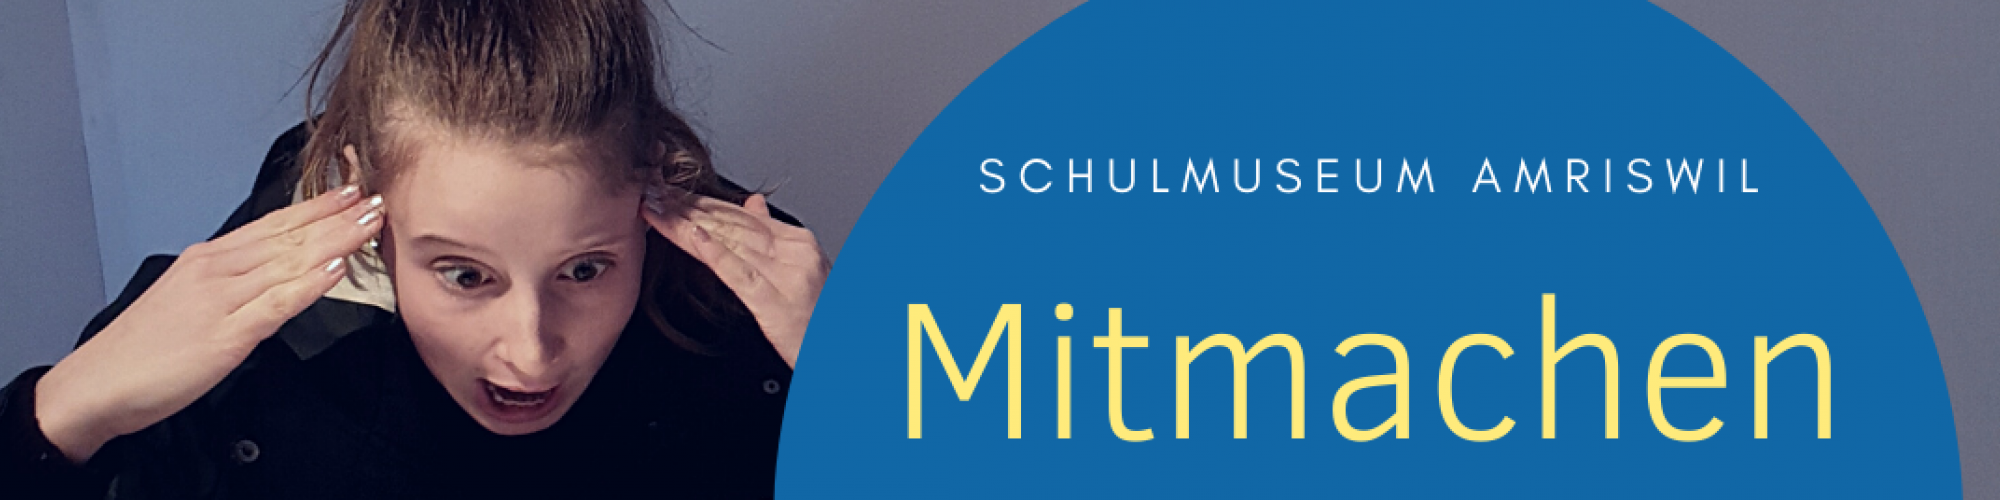 Stiftung Schulmuseum Mühlebach